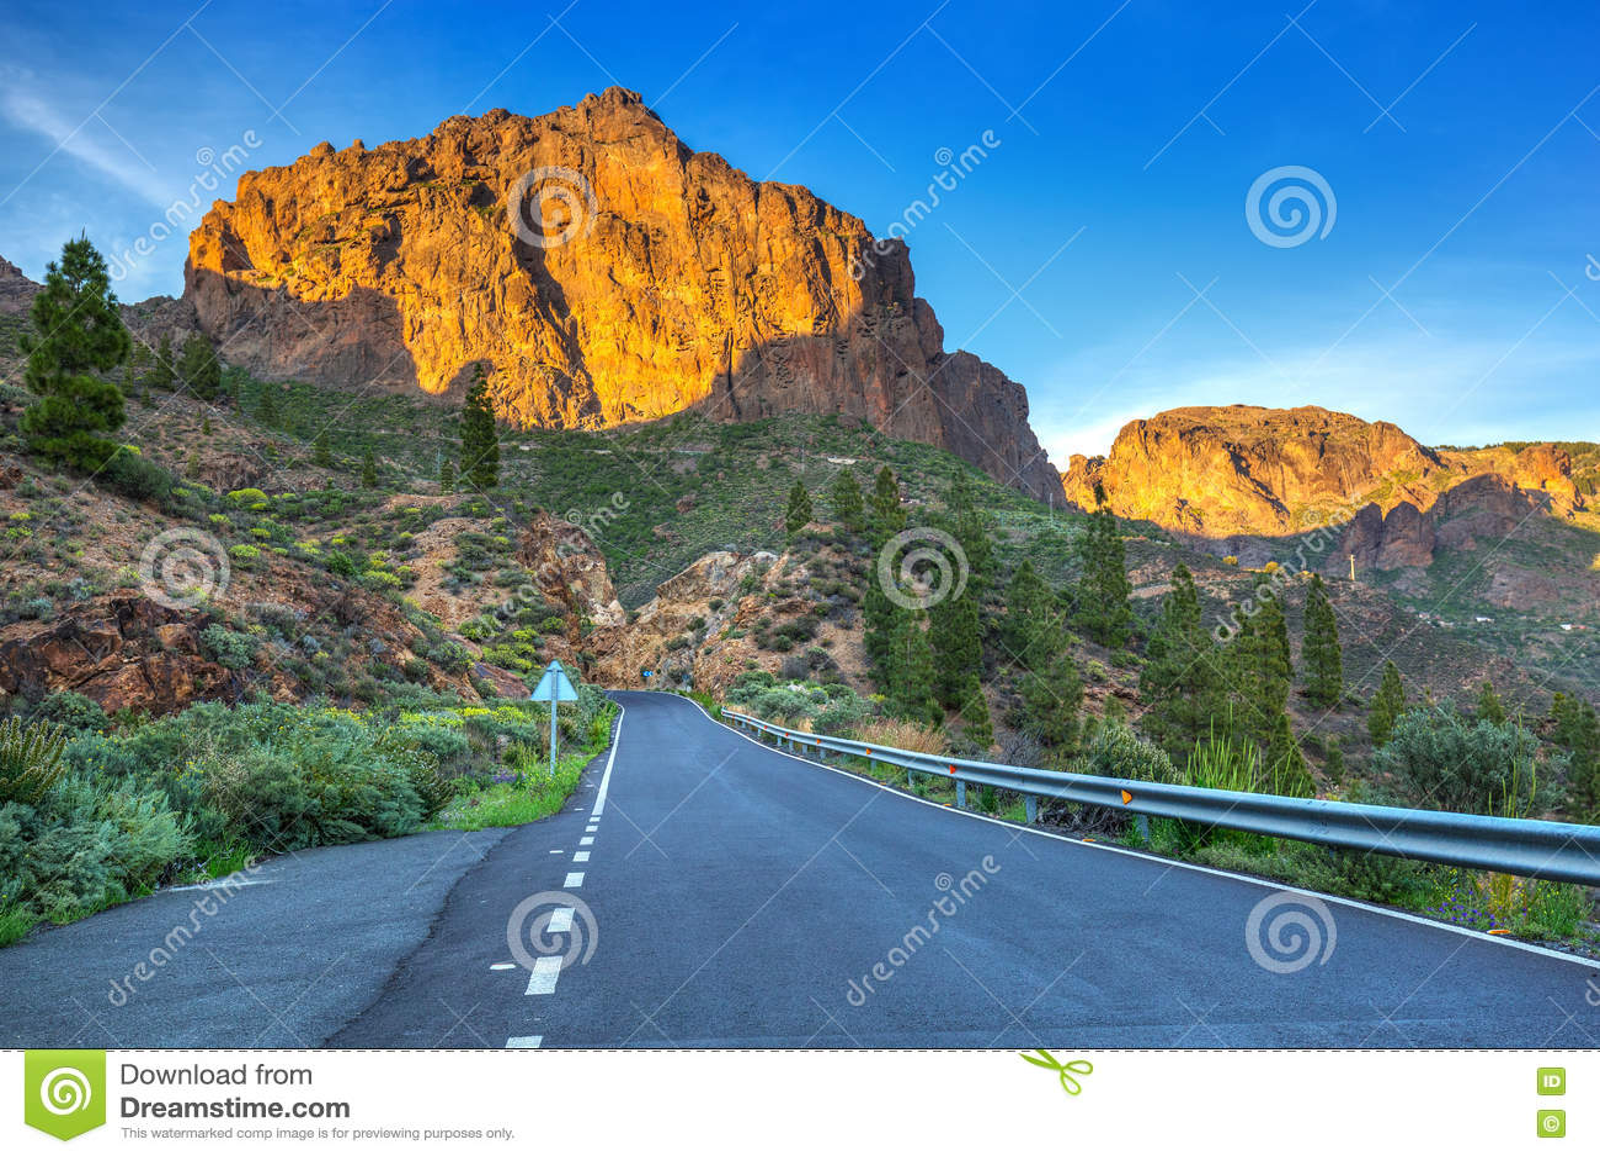 eskorte bergen gran canaria escort